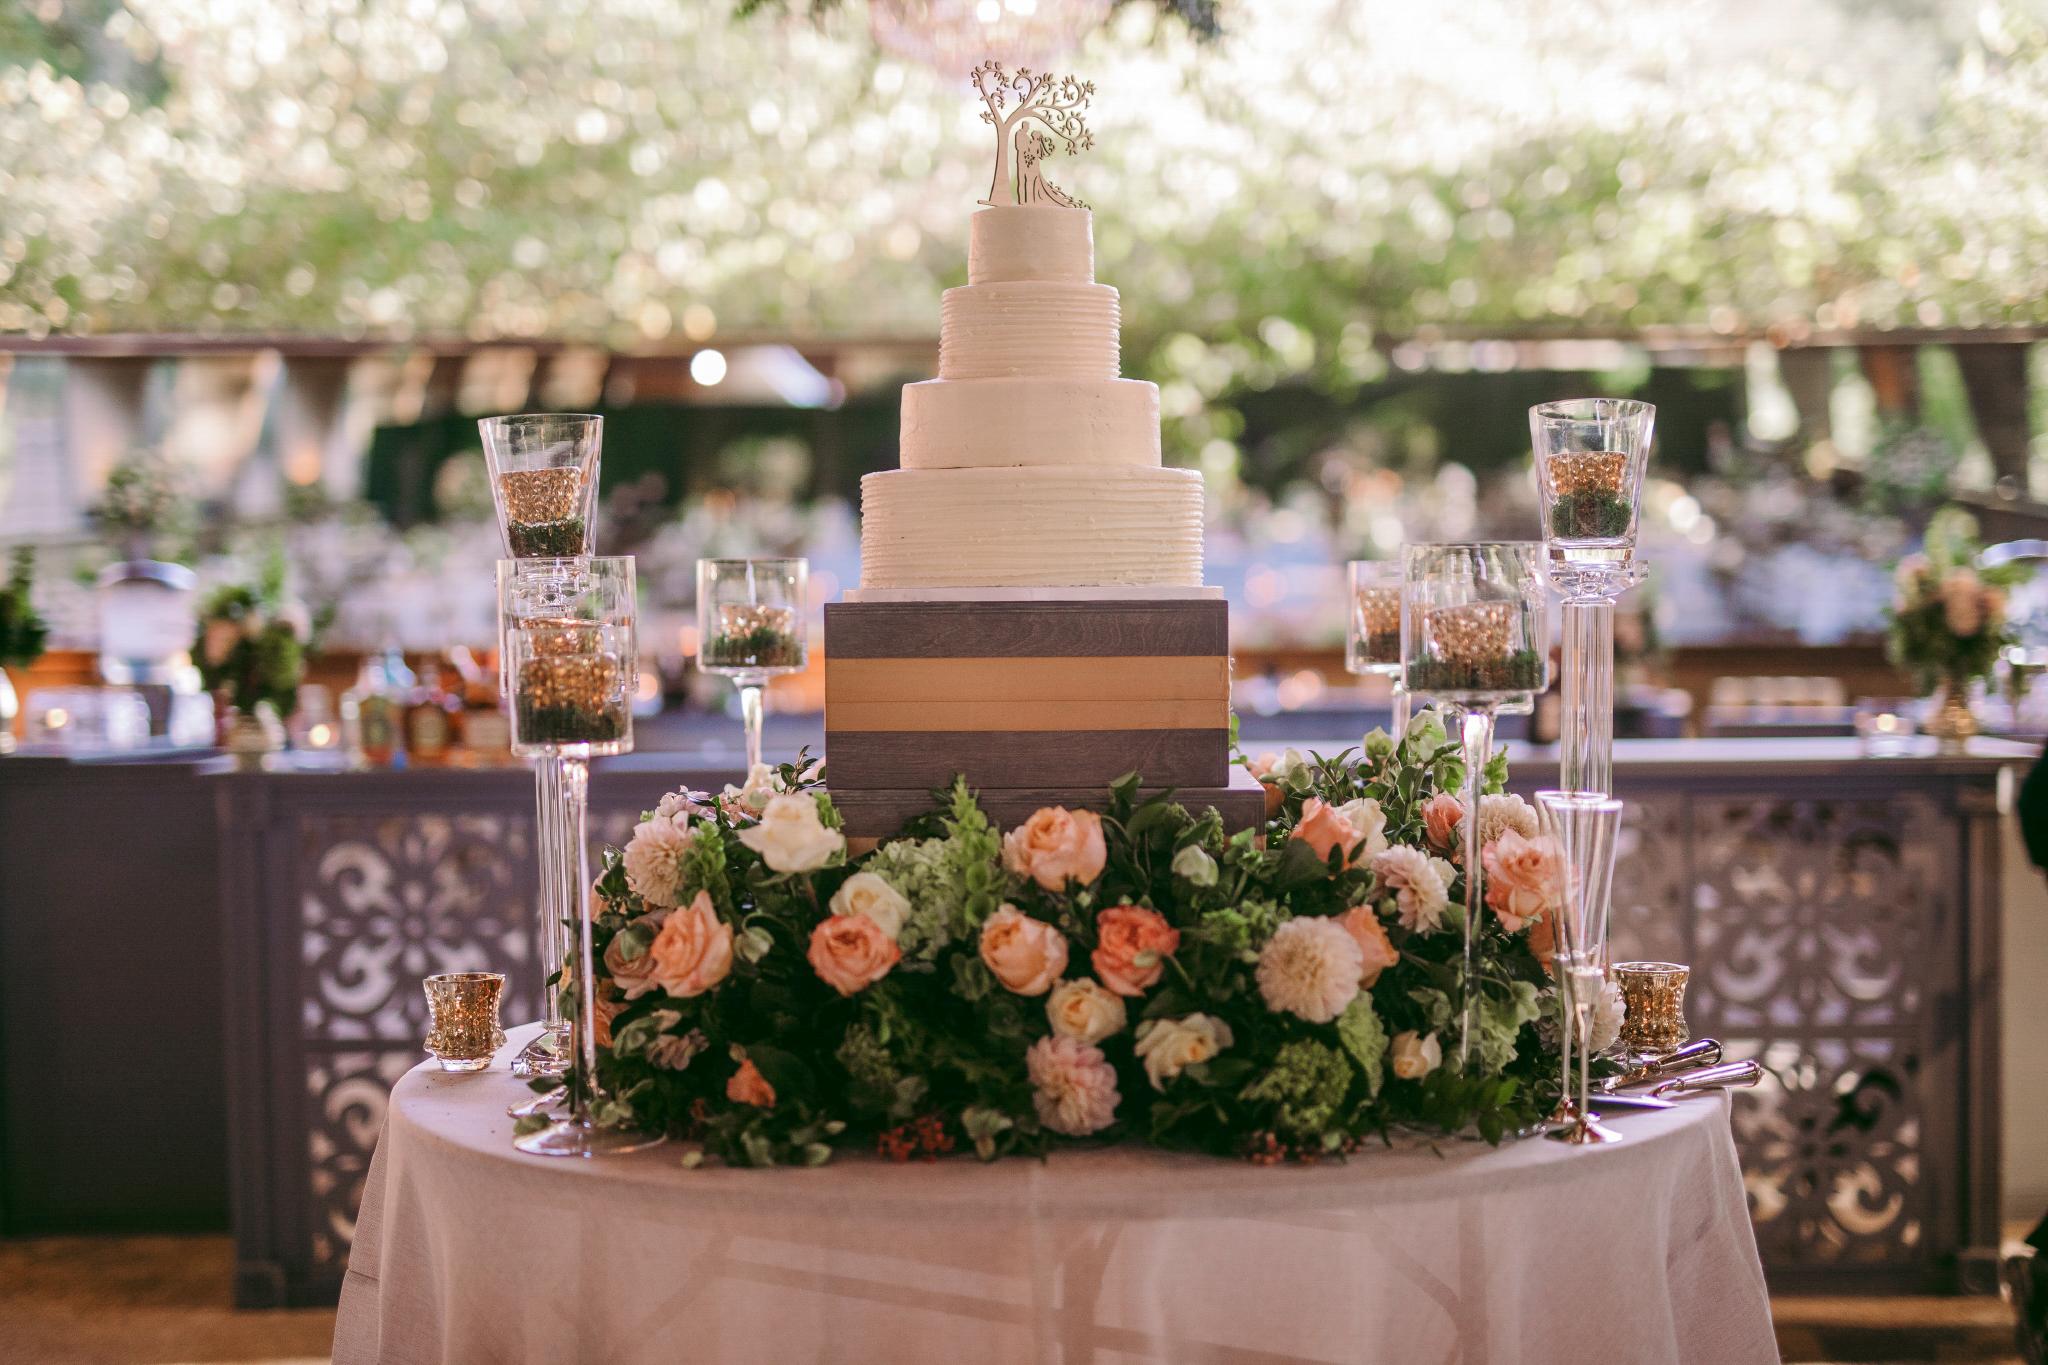 san diego wedding   photographer | white wedding cake surrounded by flowers